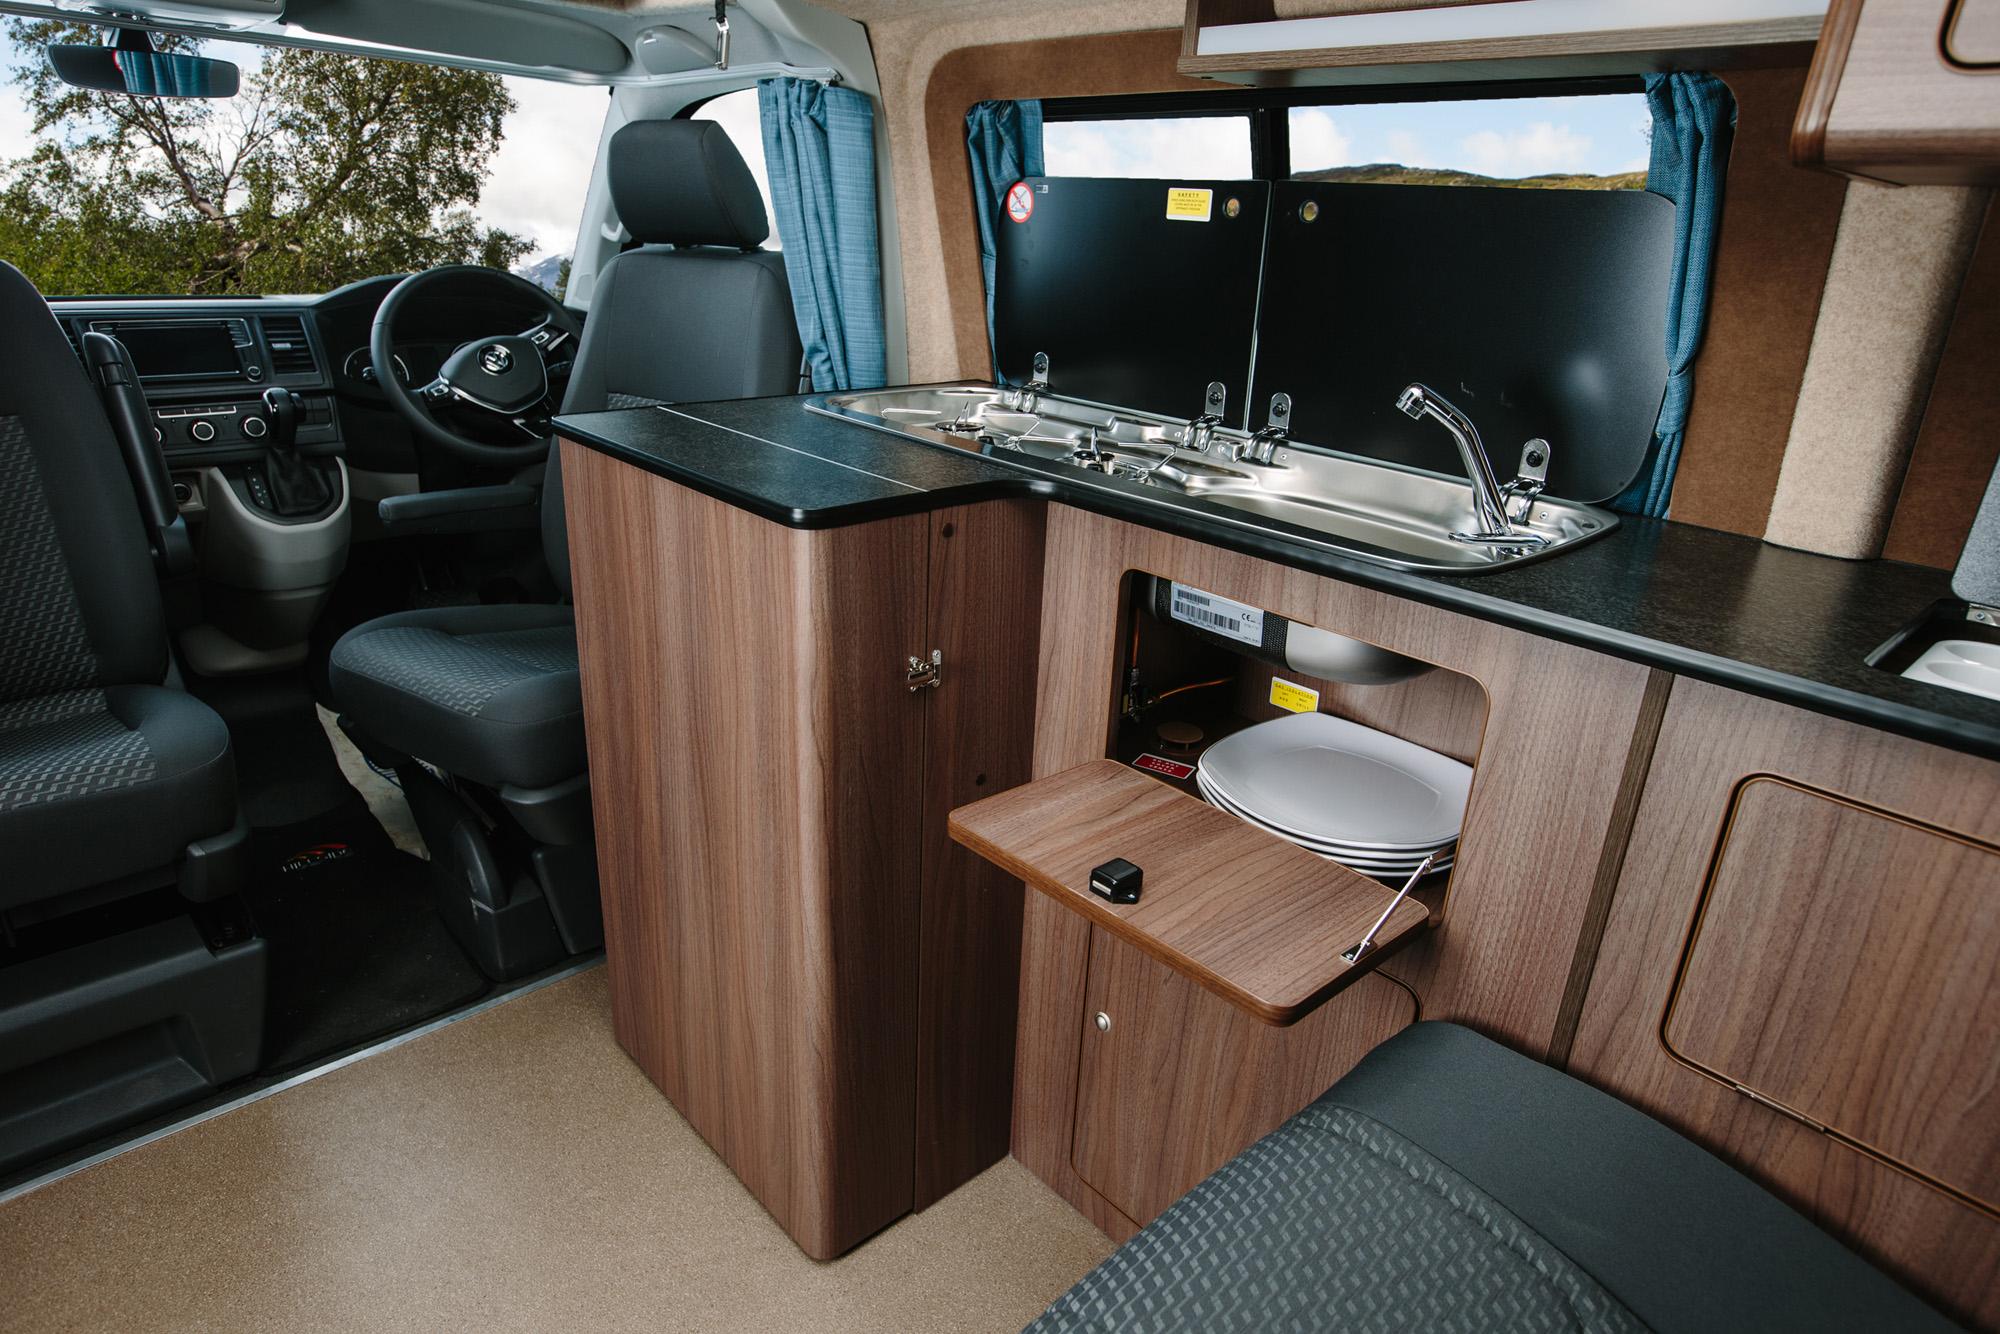 The New Vw T6 Campervan Hillside Leisure